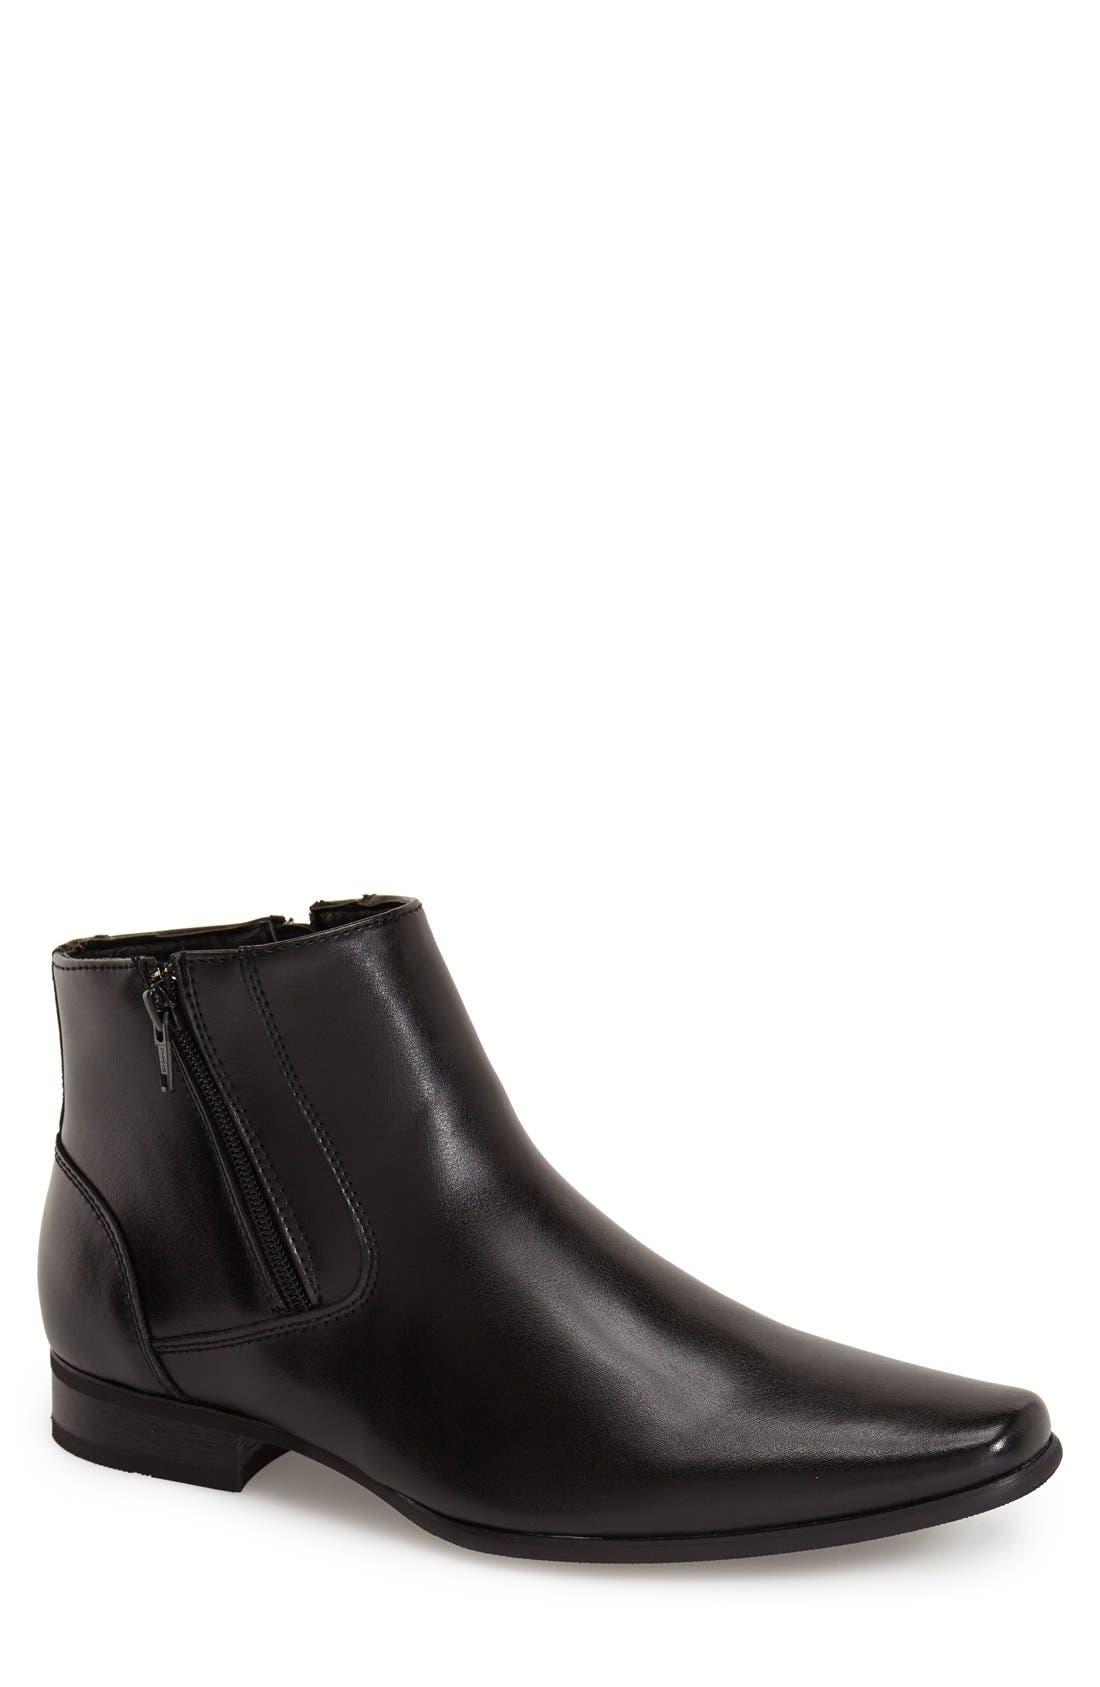 'Beck' Zip Boot, Main, color, 001